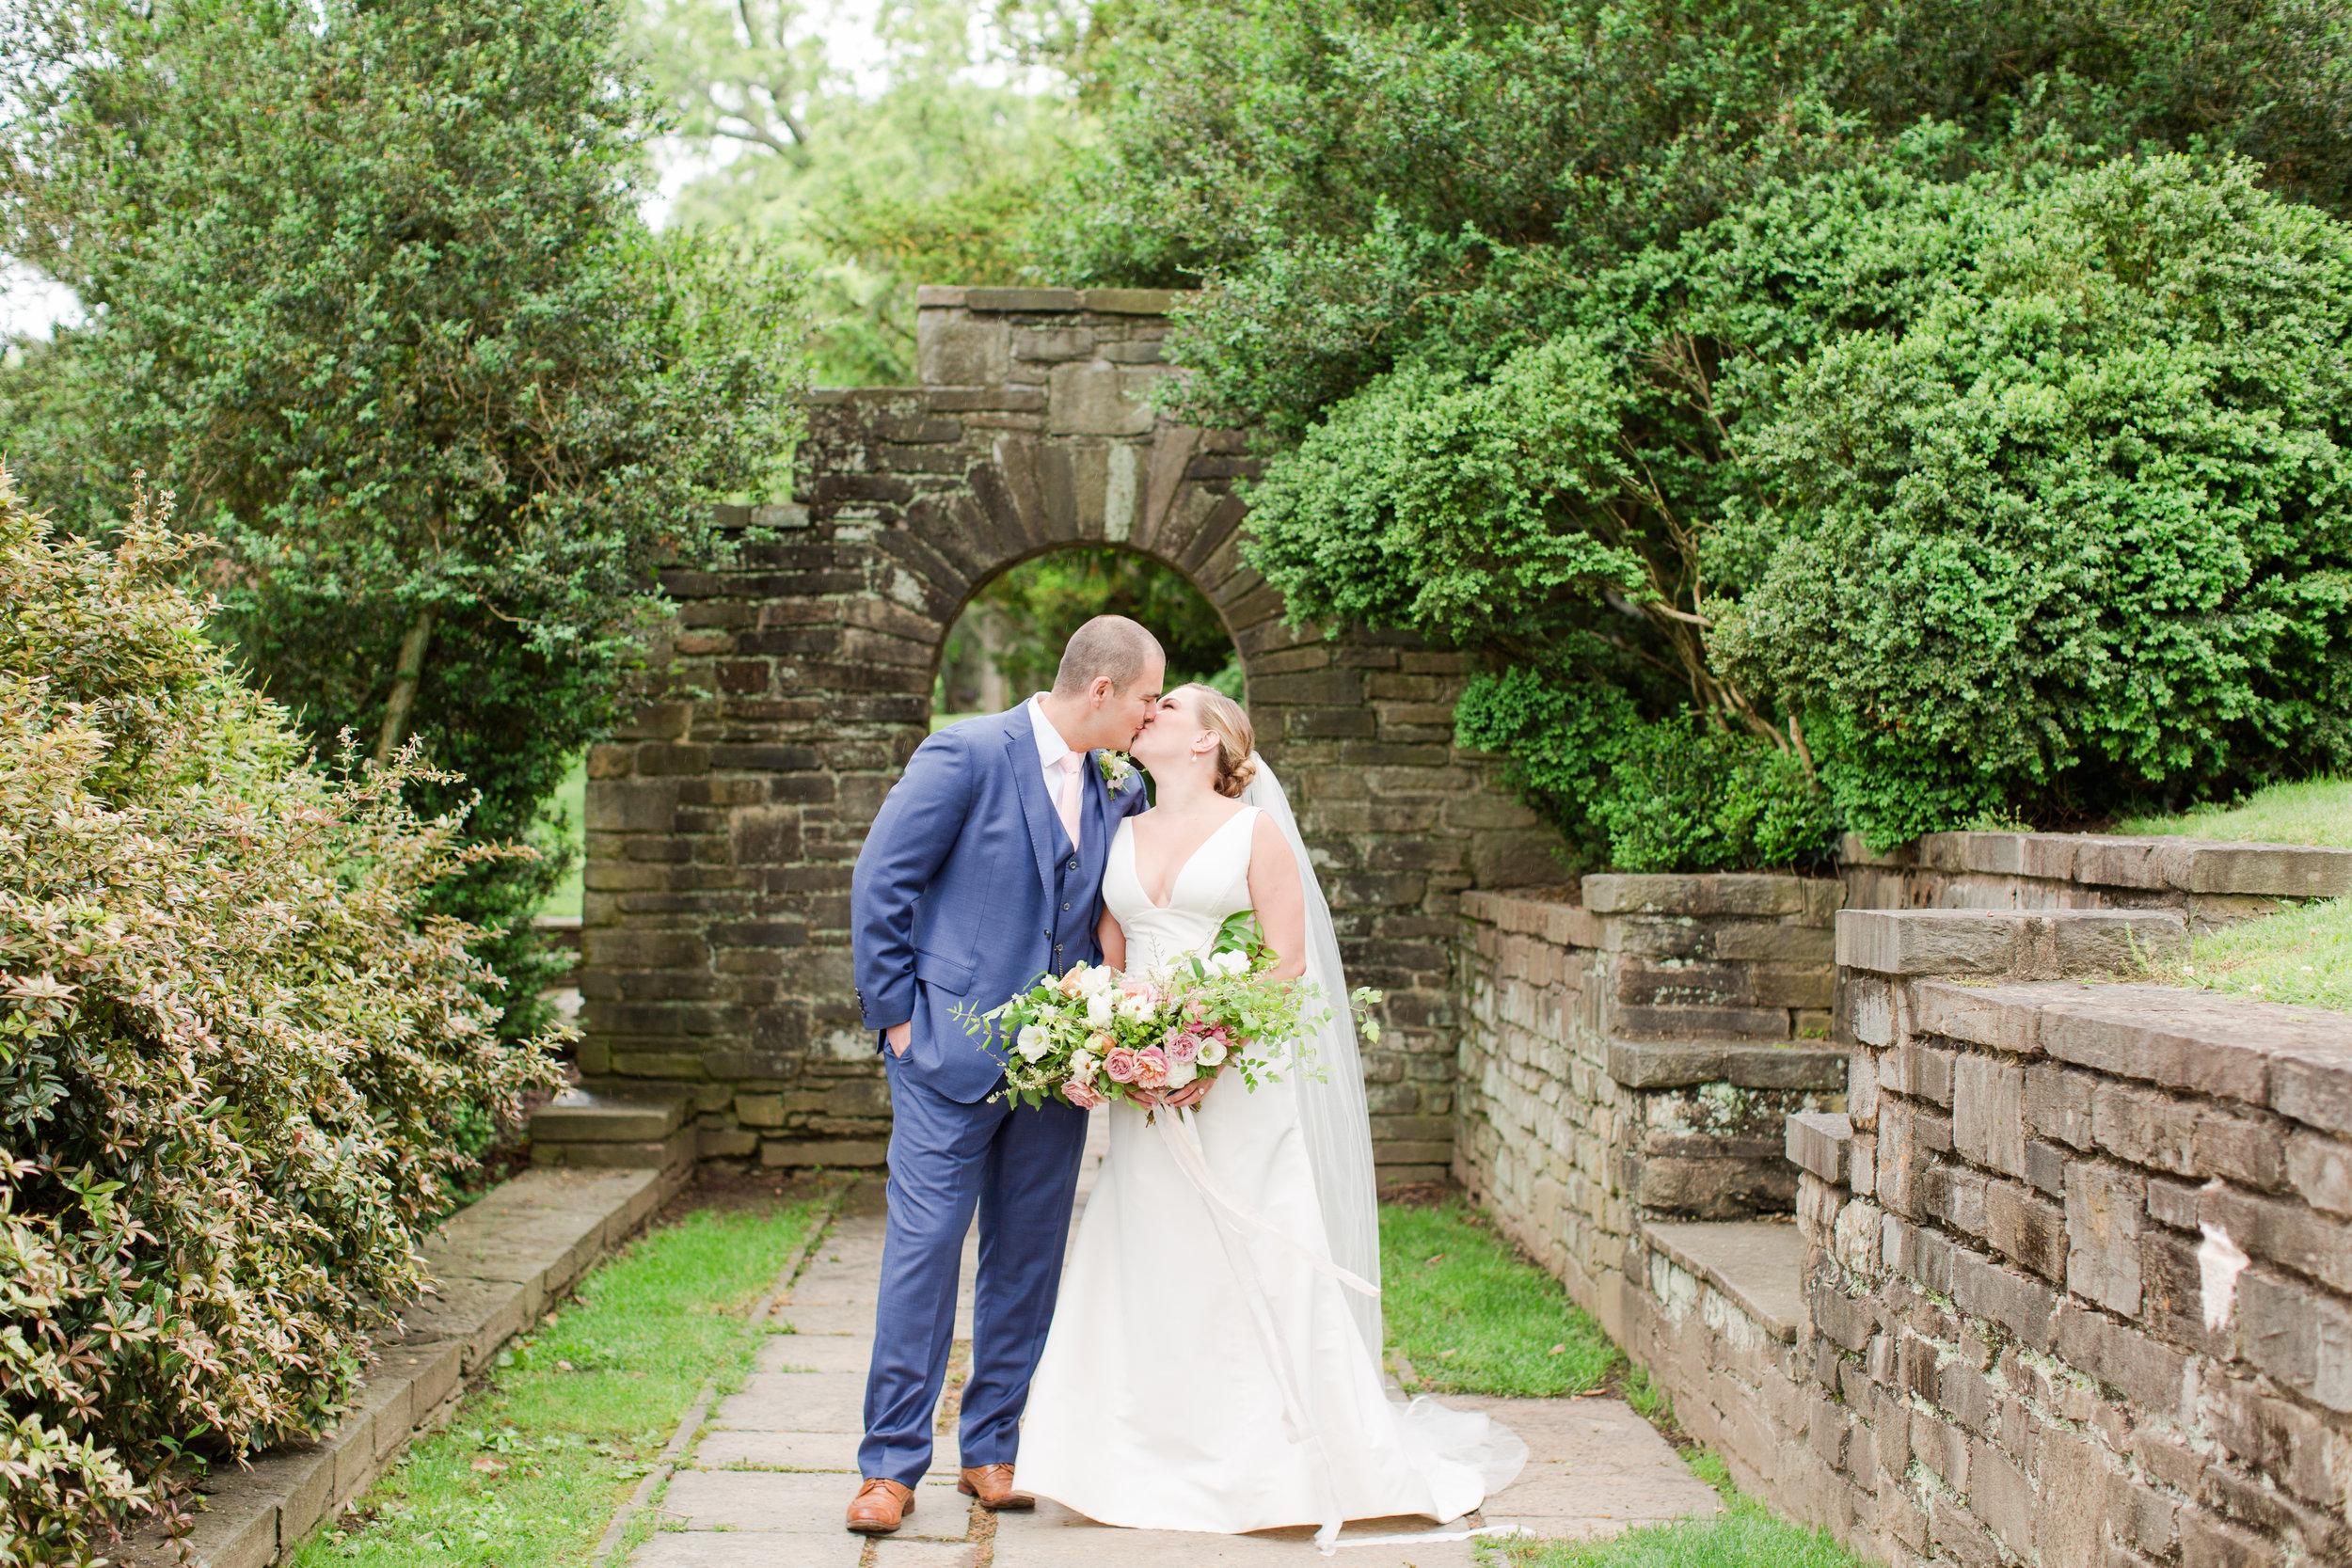 glenview-mansion-rockville-maryland-bourbon-derby-buker-wedding-bride-groom-portraitsbethanne-arthur-photography-photos-54.jpg